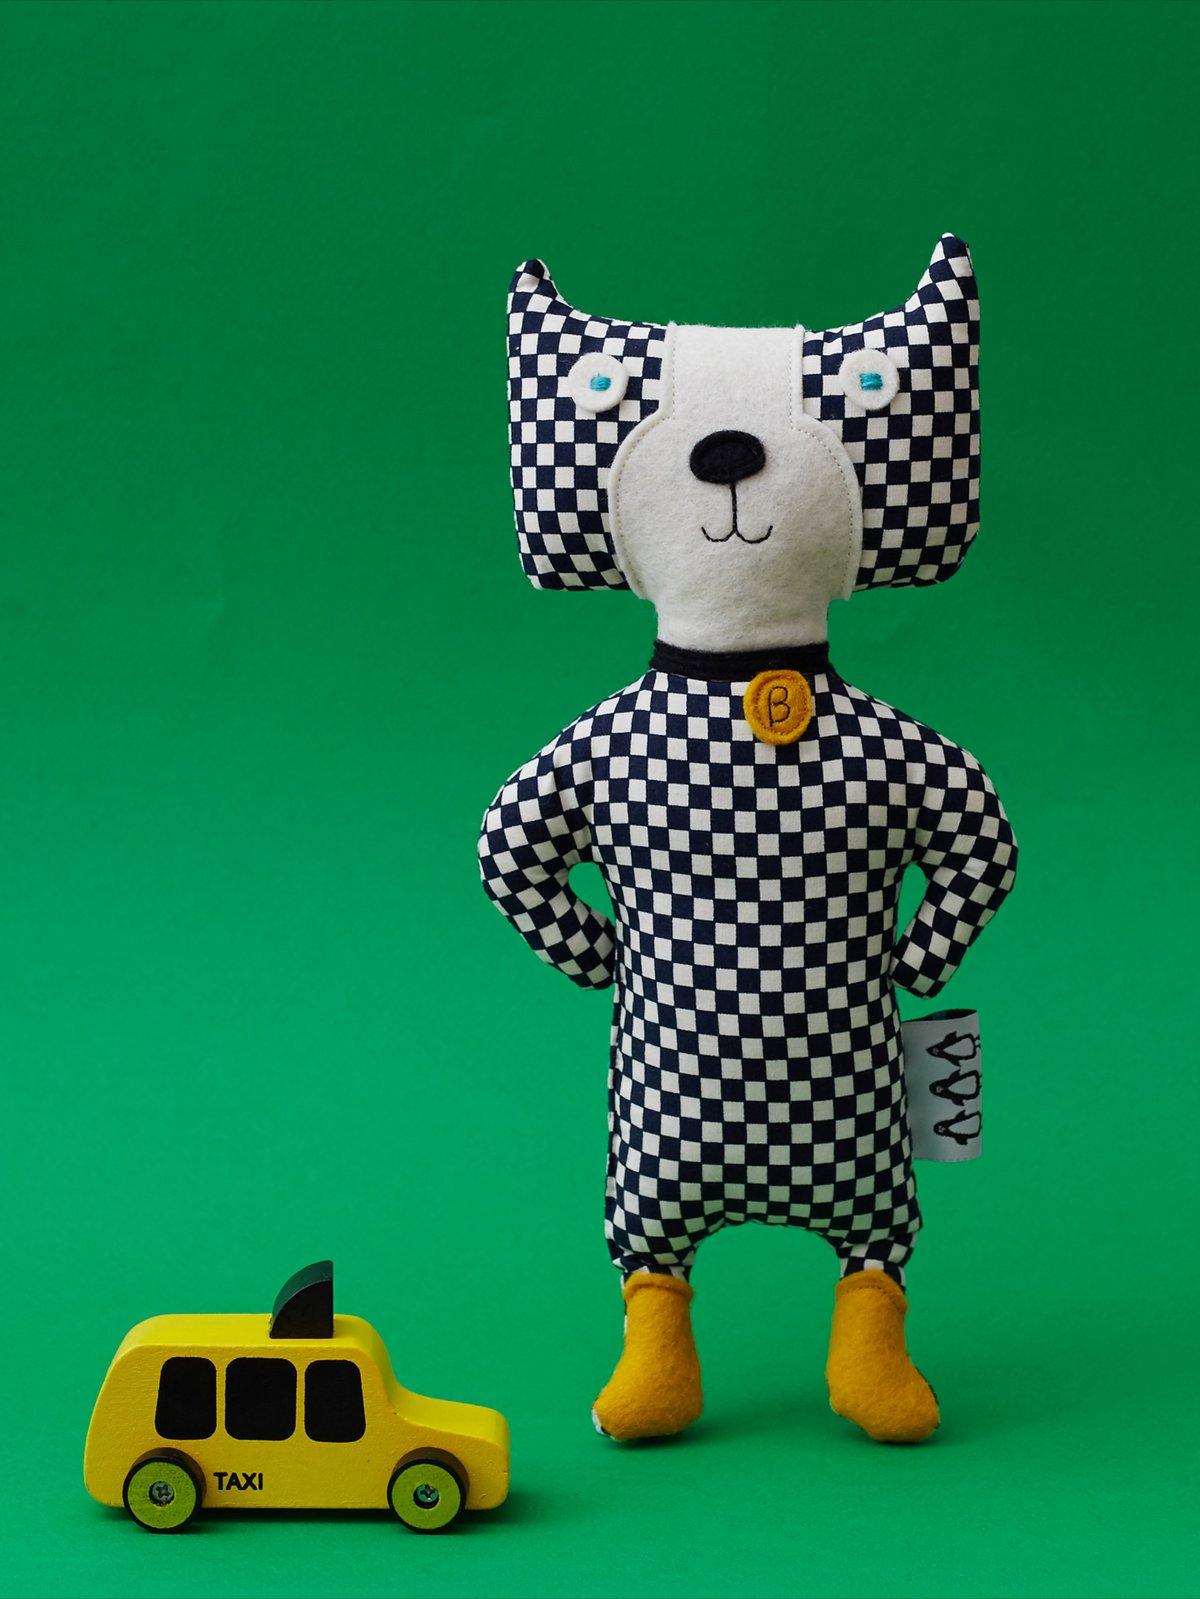 Image of Batman the Dog - Kid's Toy